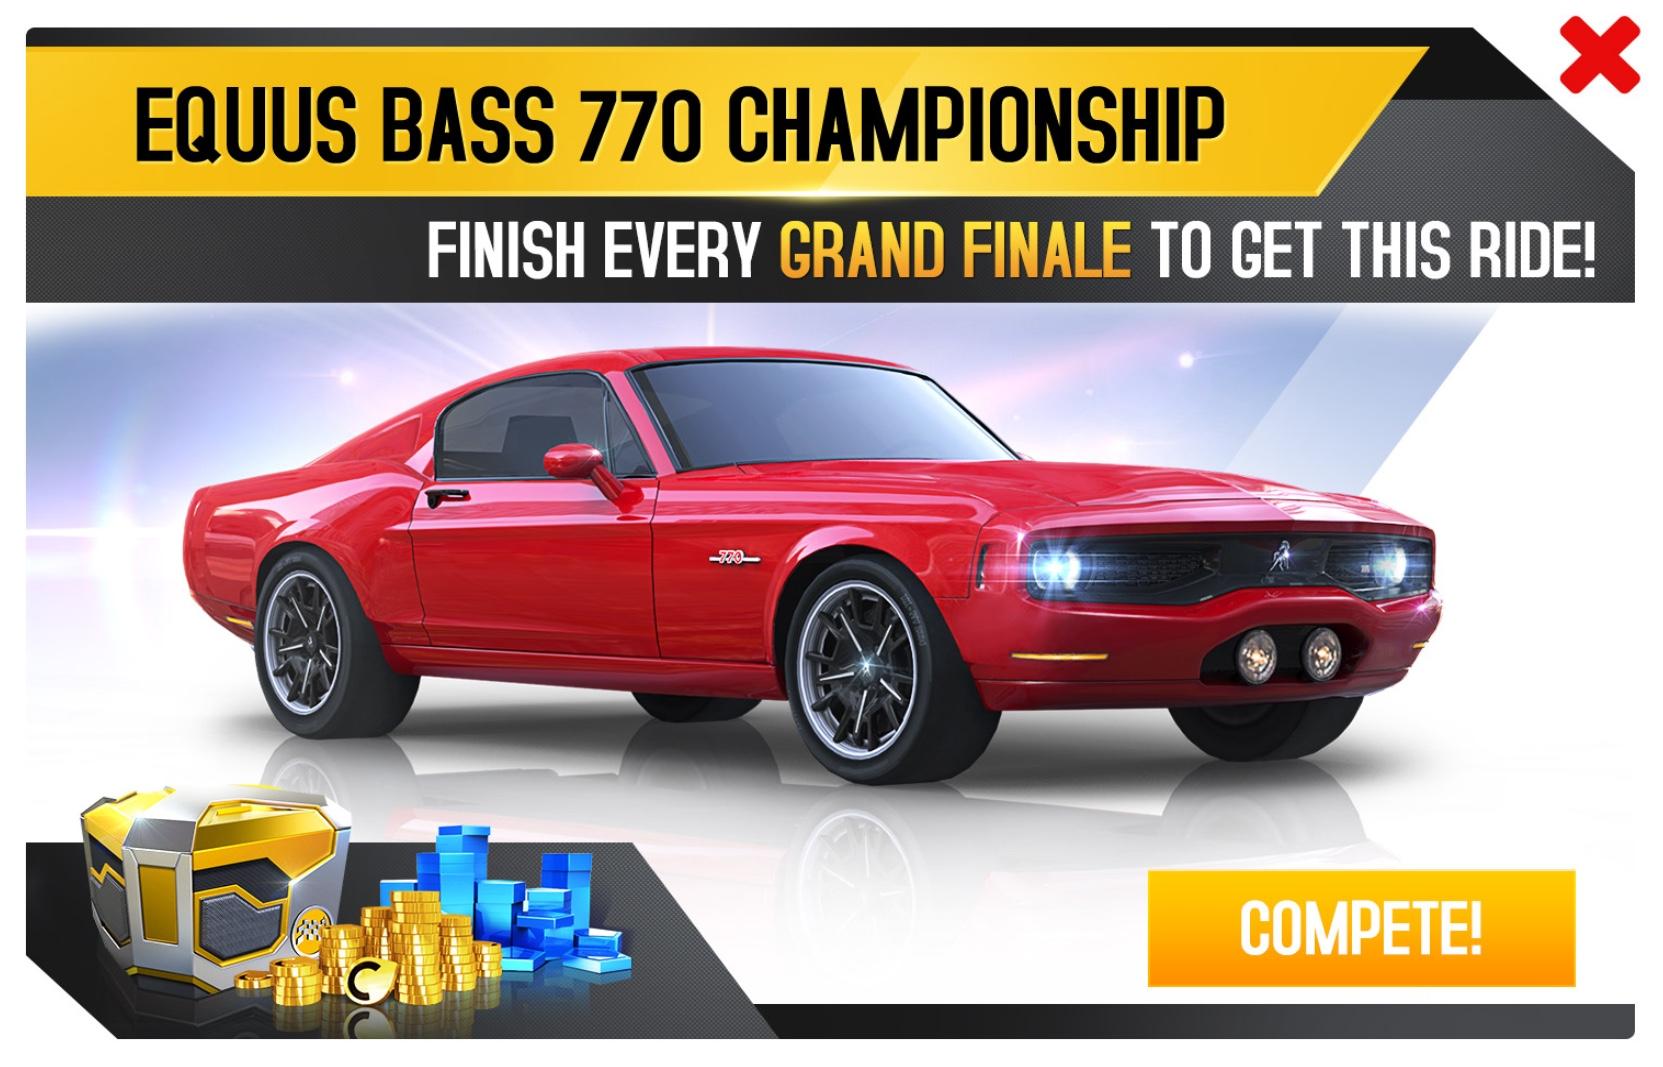 Equus Bass 770 (Championship)